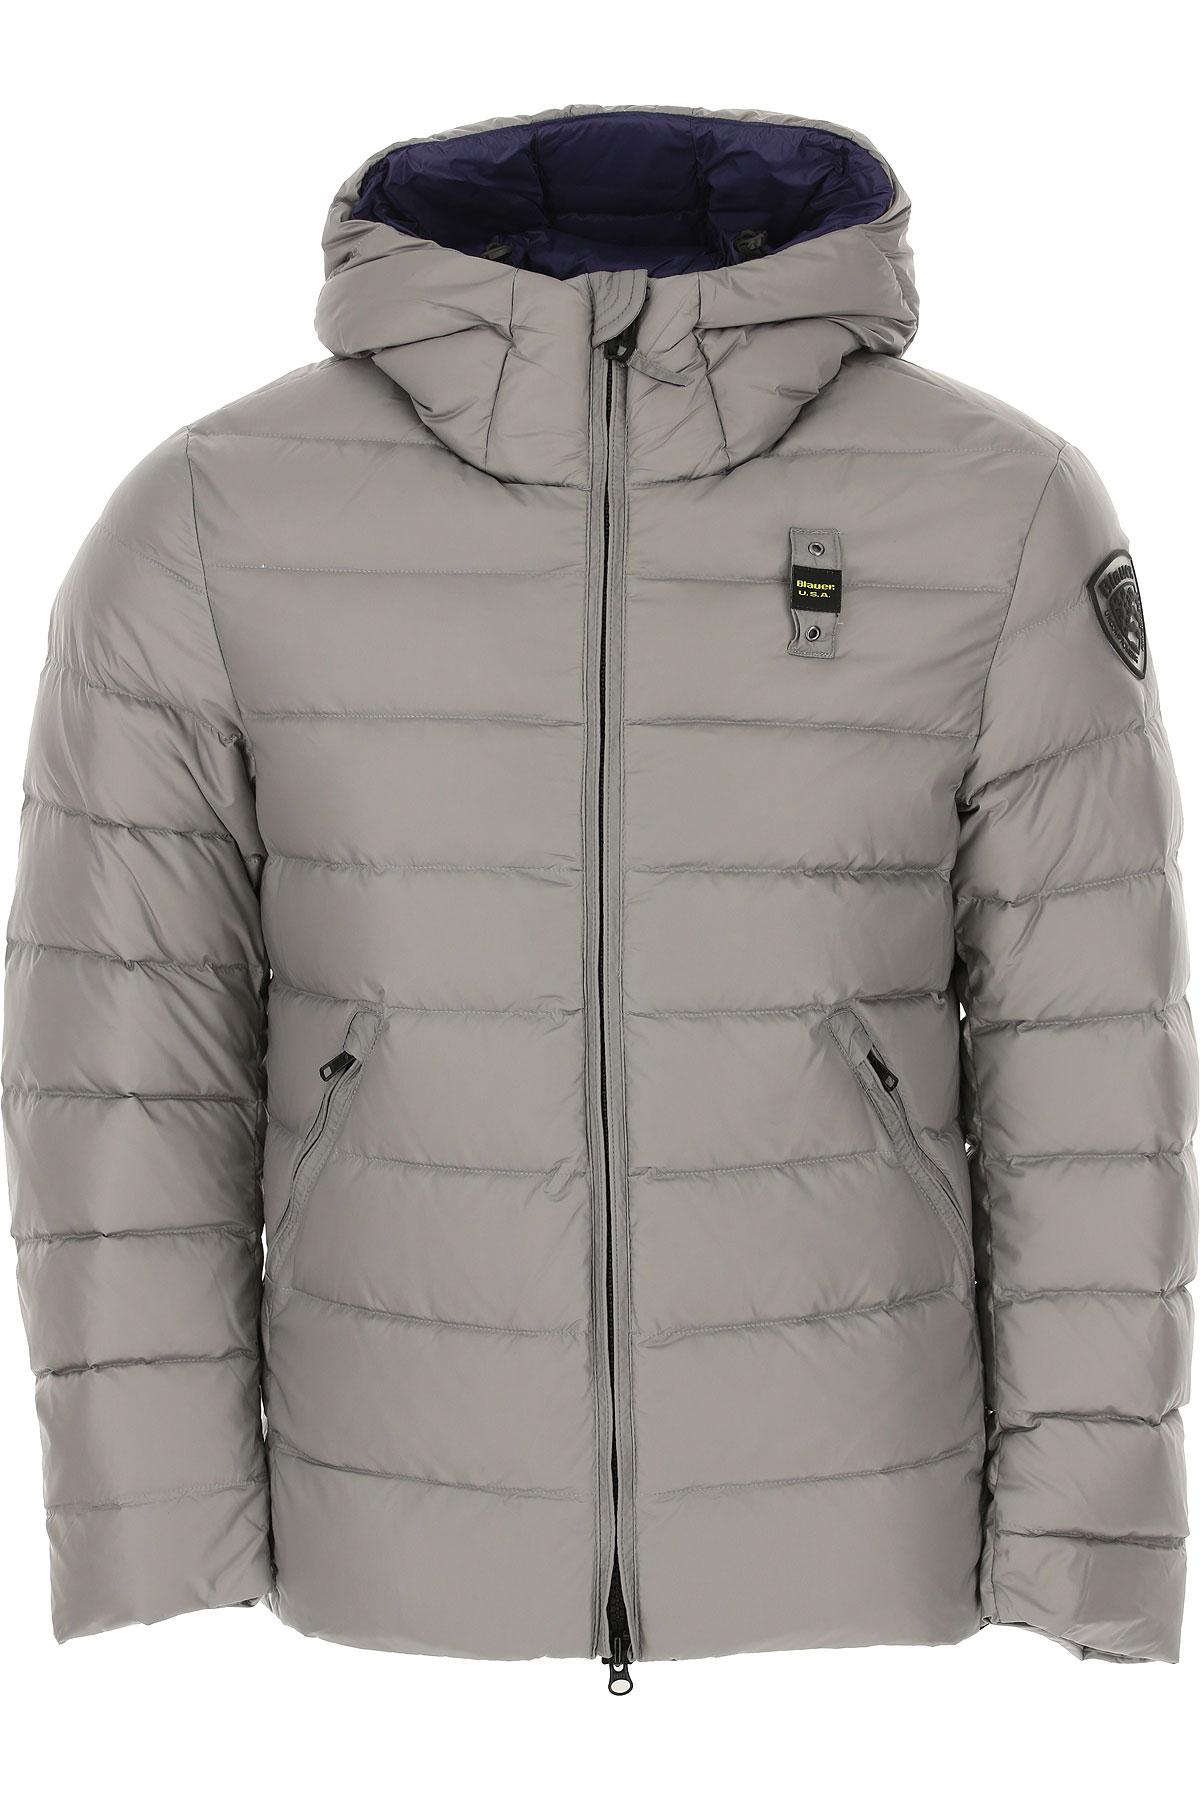 Blauer Down Jacket for Men, Puffer Ski Jacket On Sale, Light Grey, polyamide, 2019, L M S XL XXL